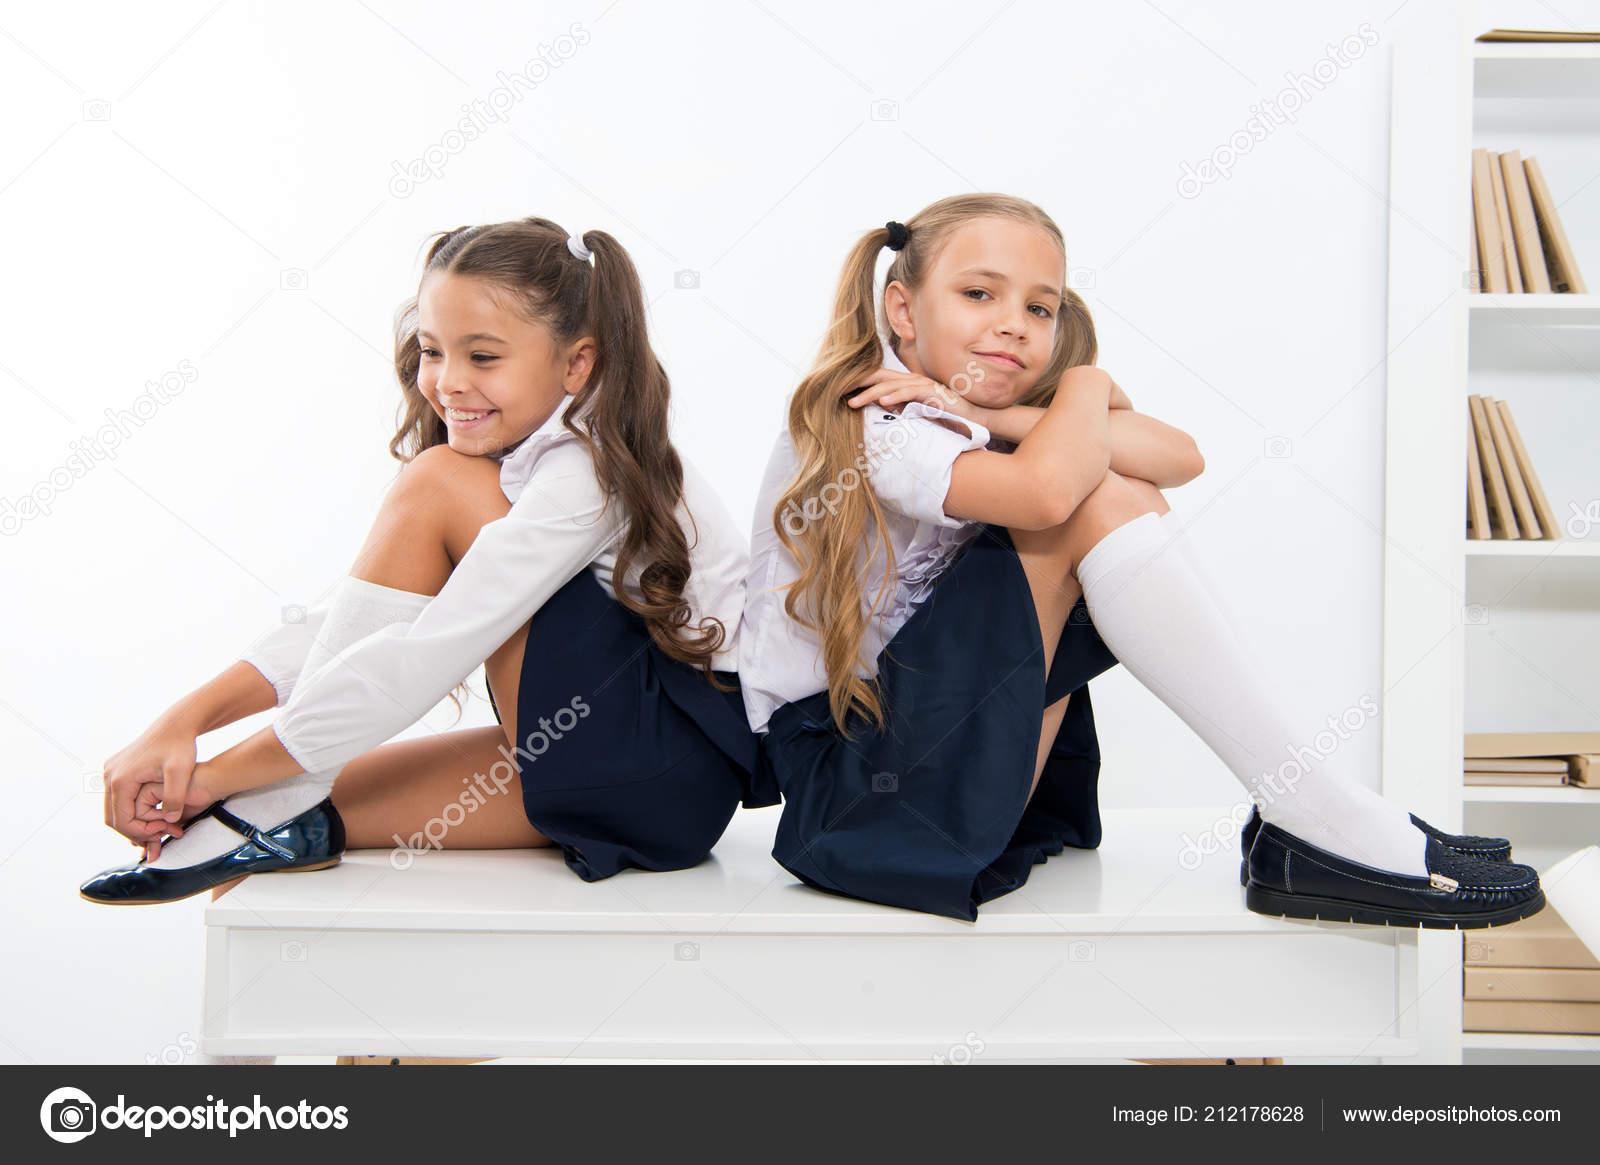 School Break Concept Schoolgirls Cute Pony Tails Hairstyle Sit On